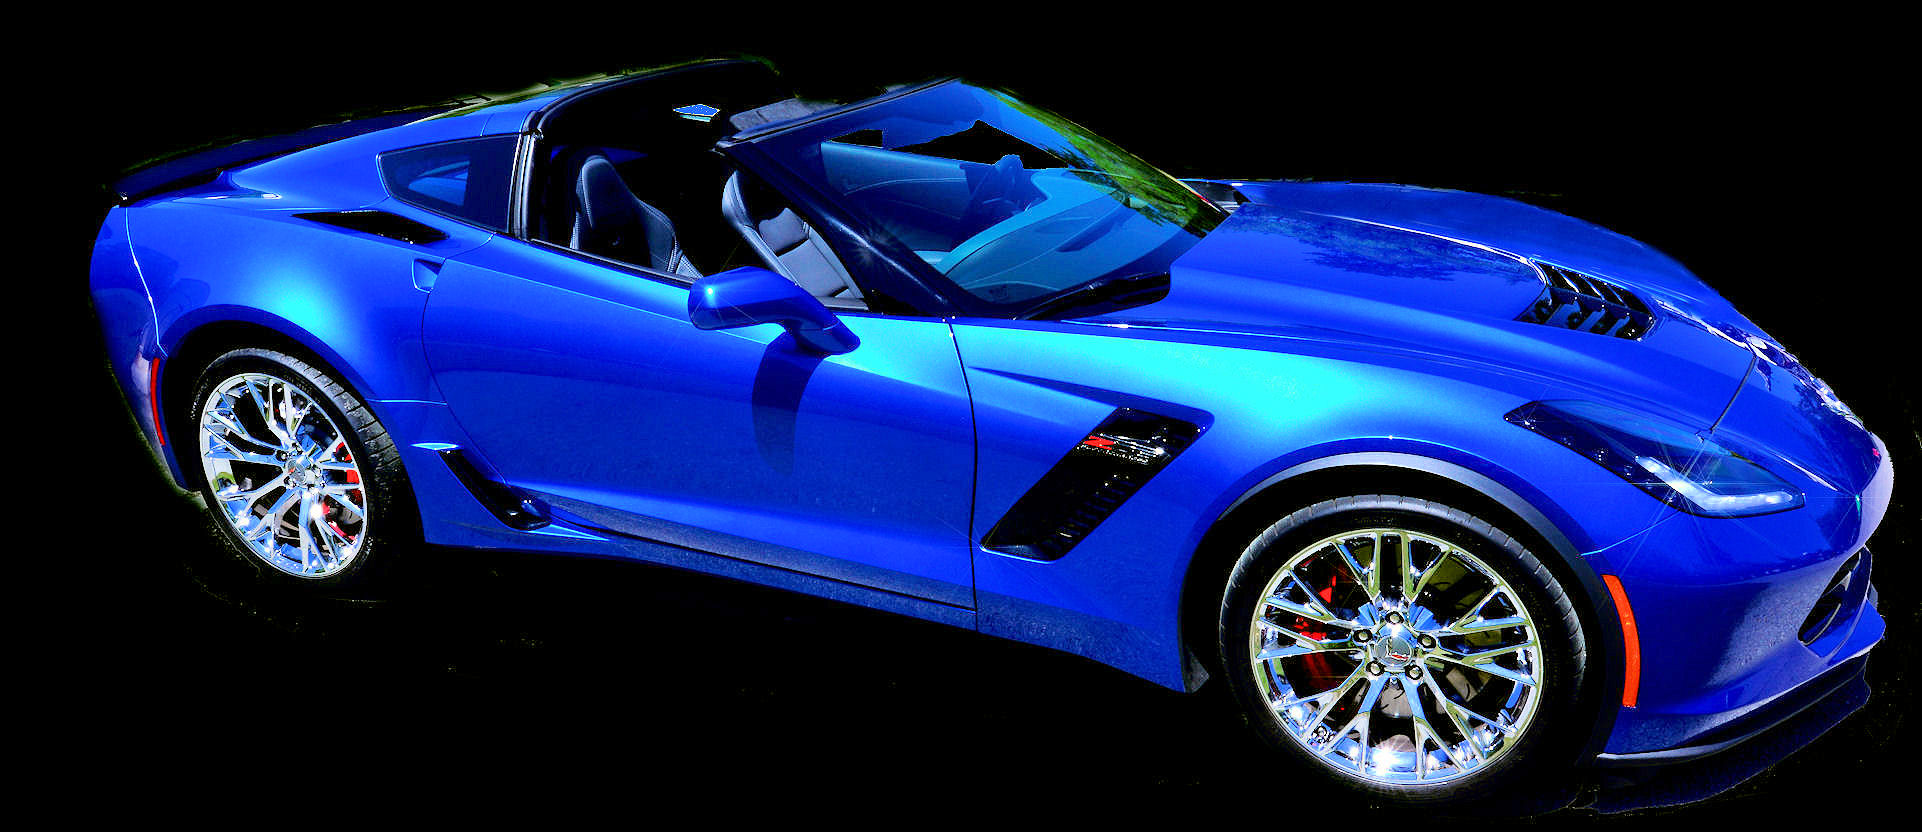 Name:  Wayne's ride 1080i-3.jpg Views: 242 Size:  276.2 KB